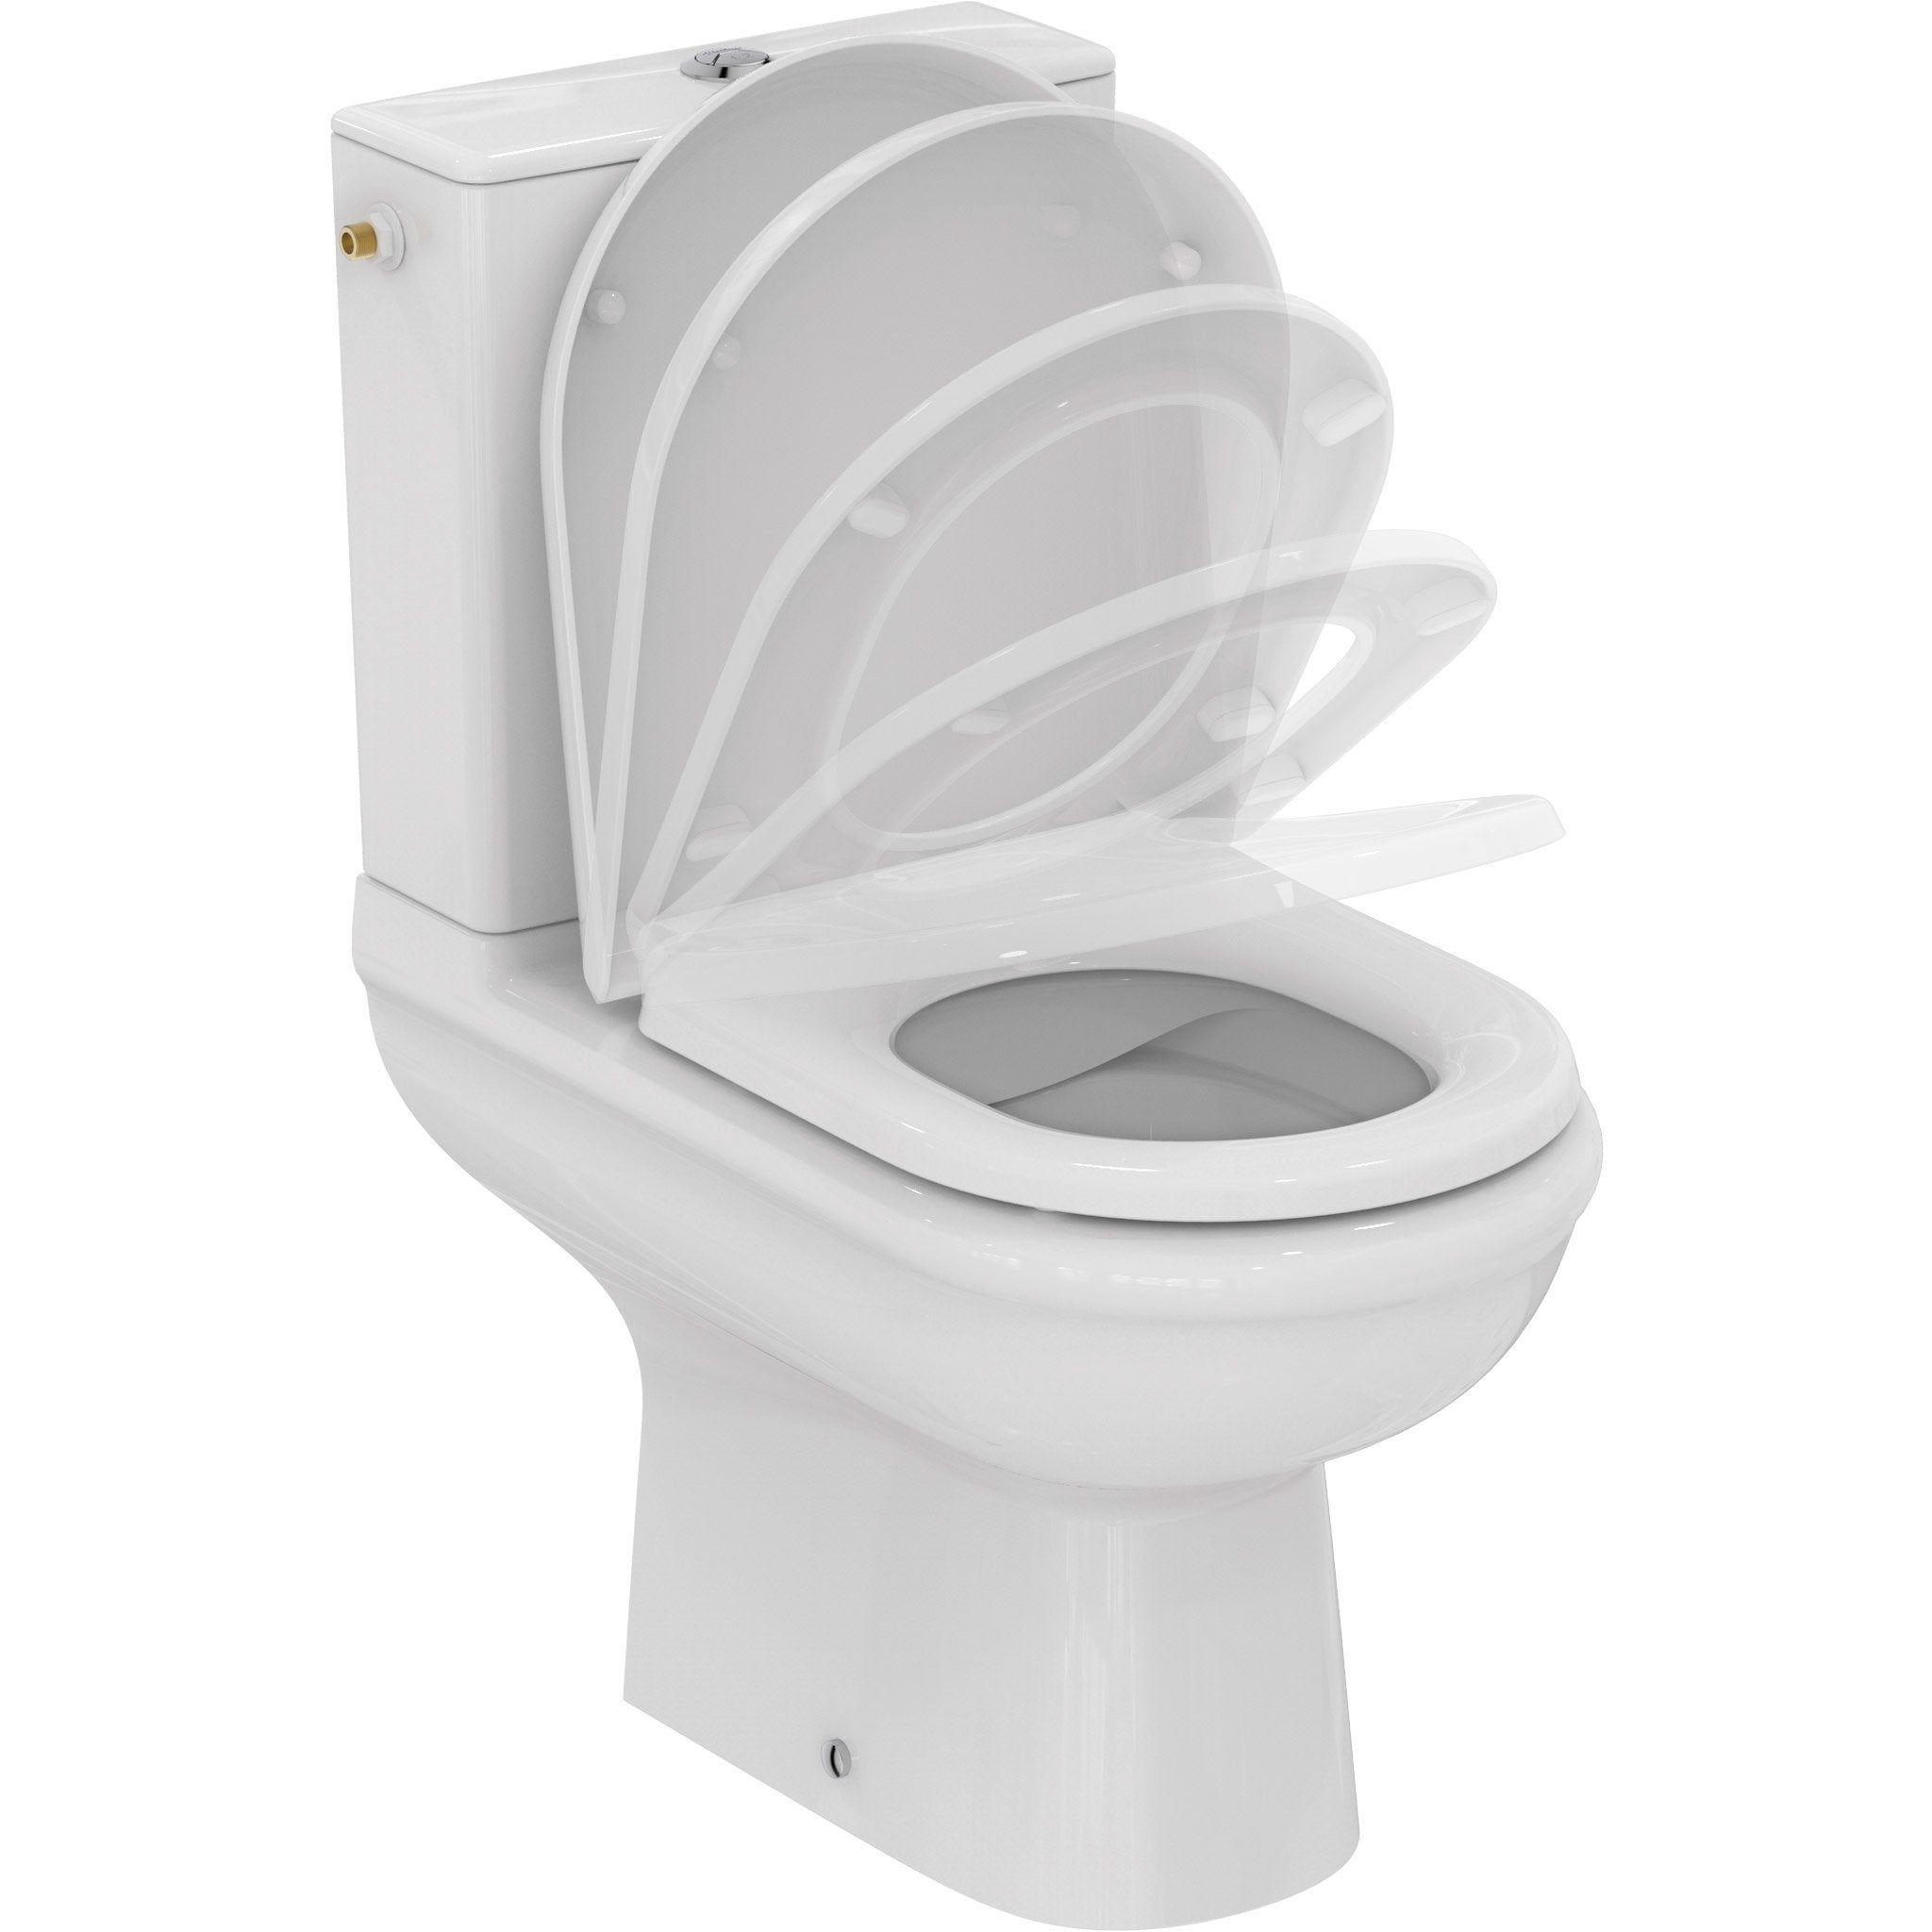 Pack Wc A Poser Sortie Horizontale Sans Bride Exacto Ideal Standard Wc A Poser Pack Wc Et Toilettes